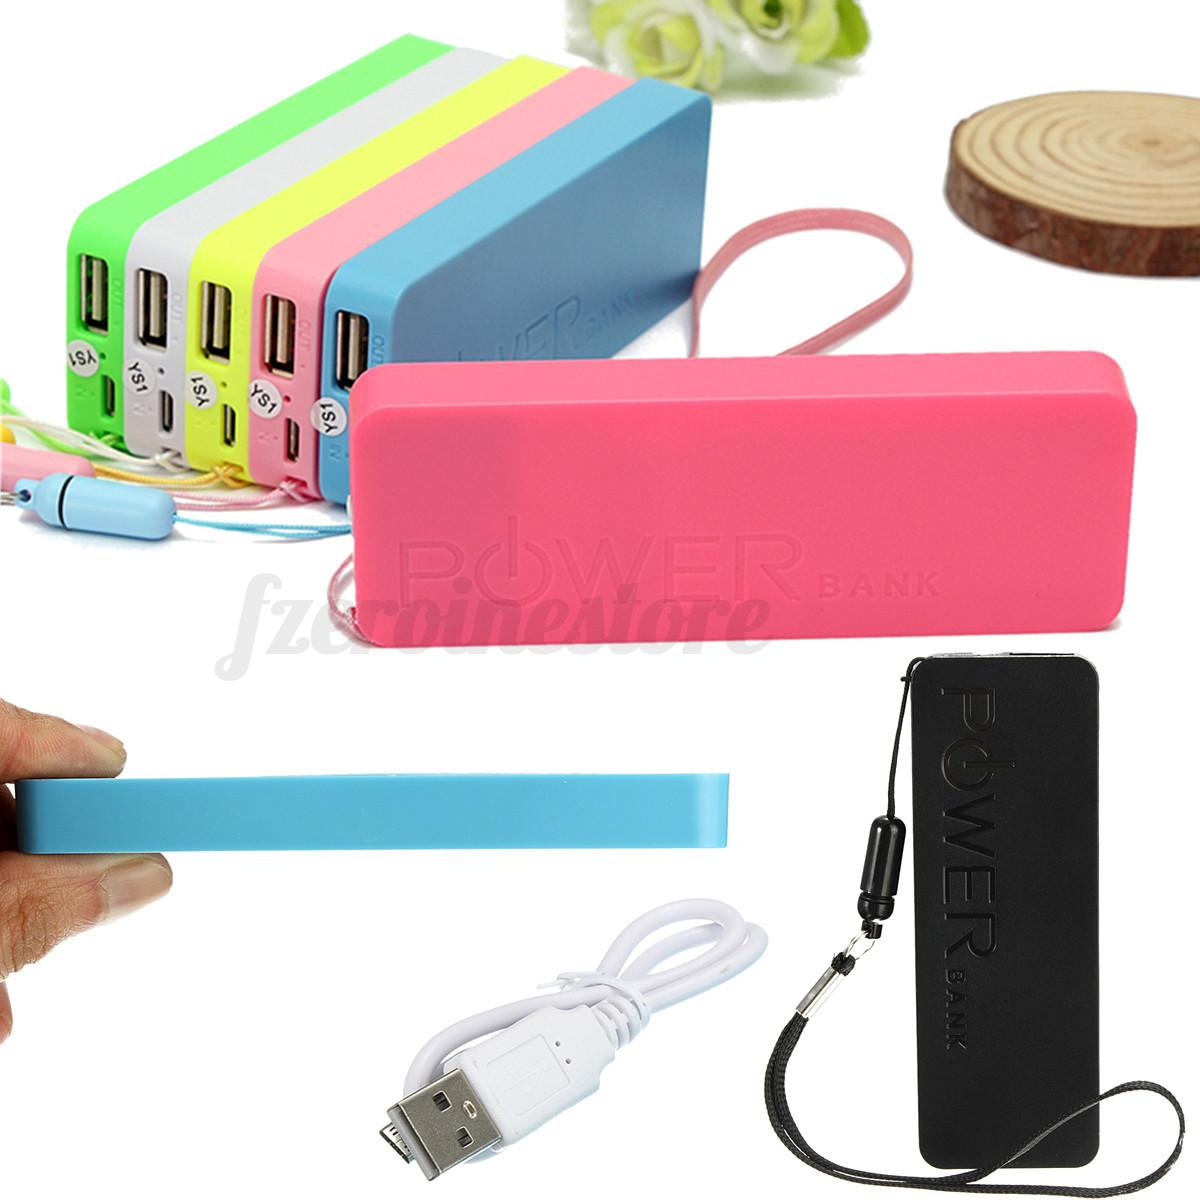 Ultrathin 5600mAh External Portable Power Bank USB Battery